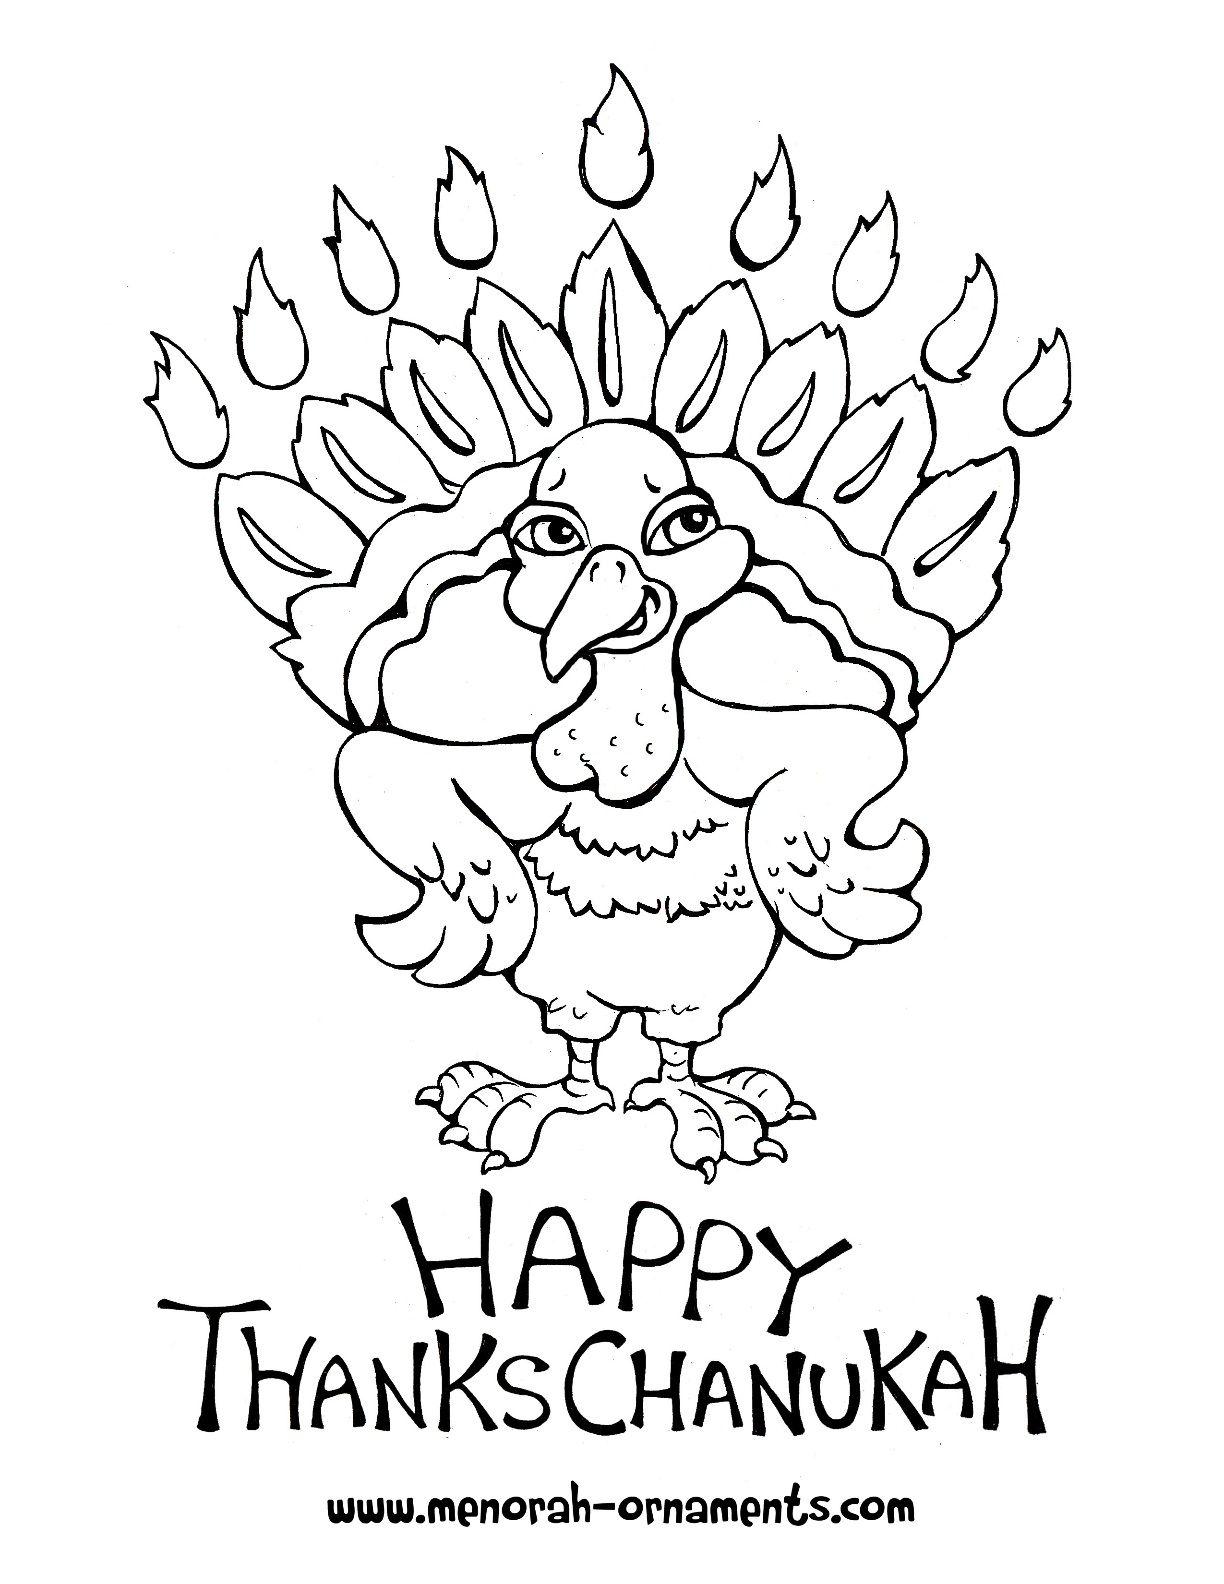 Free Thanksgiving Chanukah Coloring Sheet From